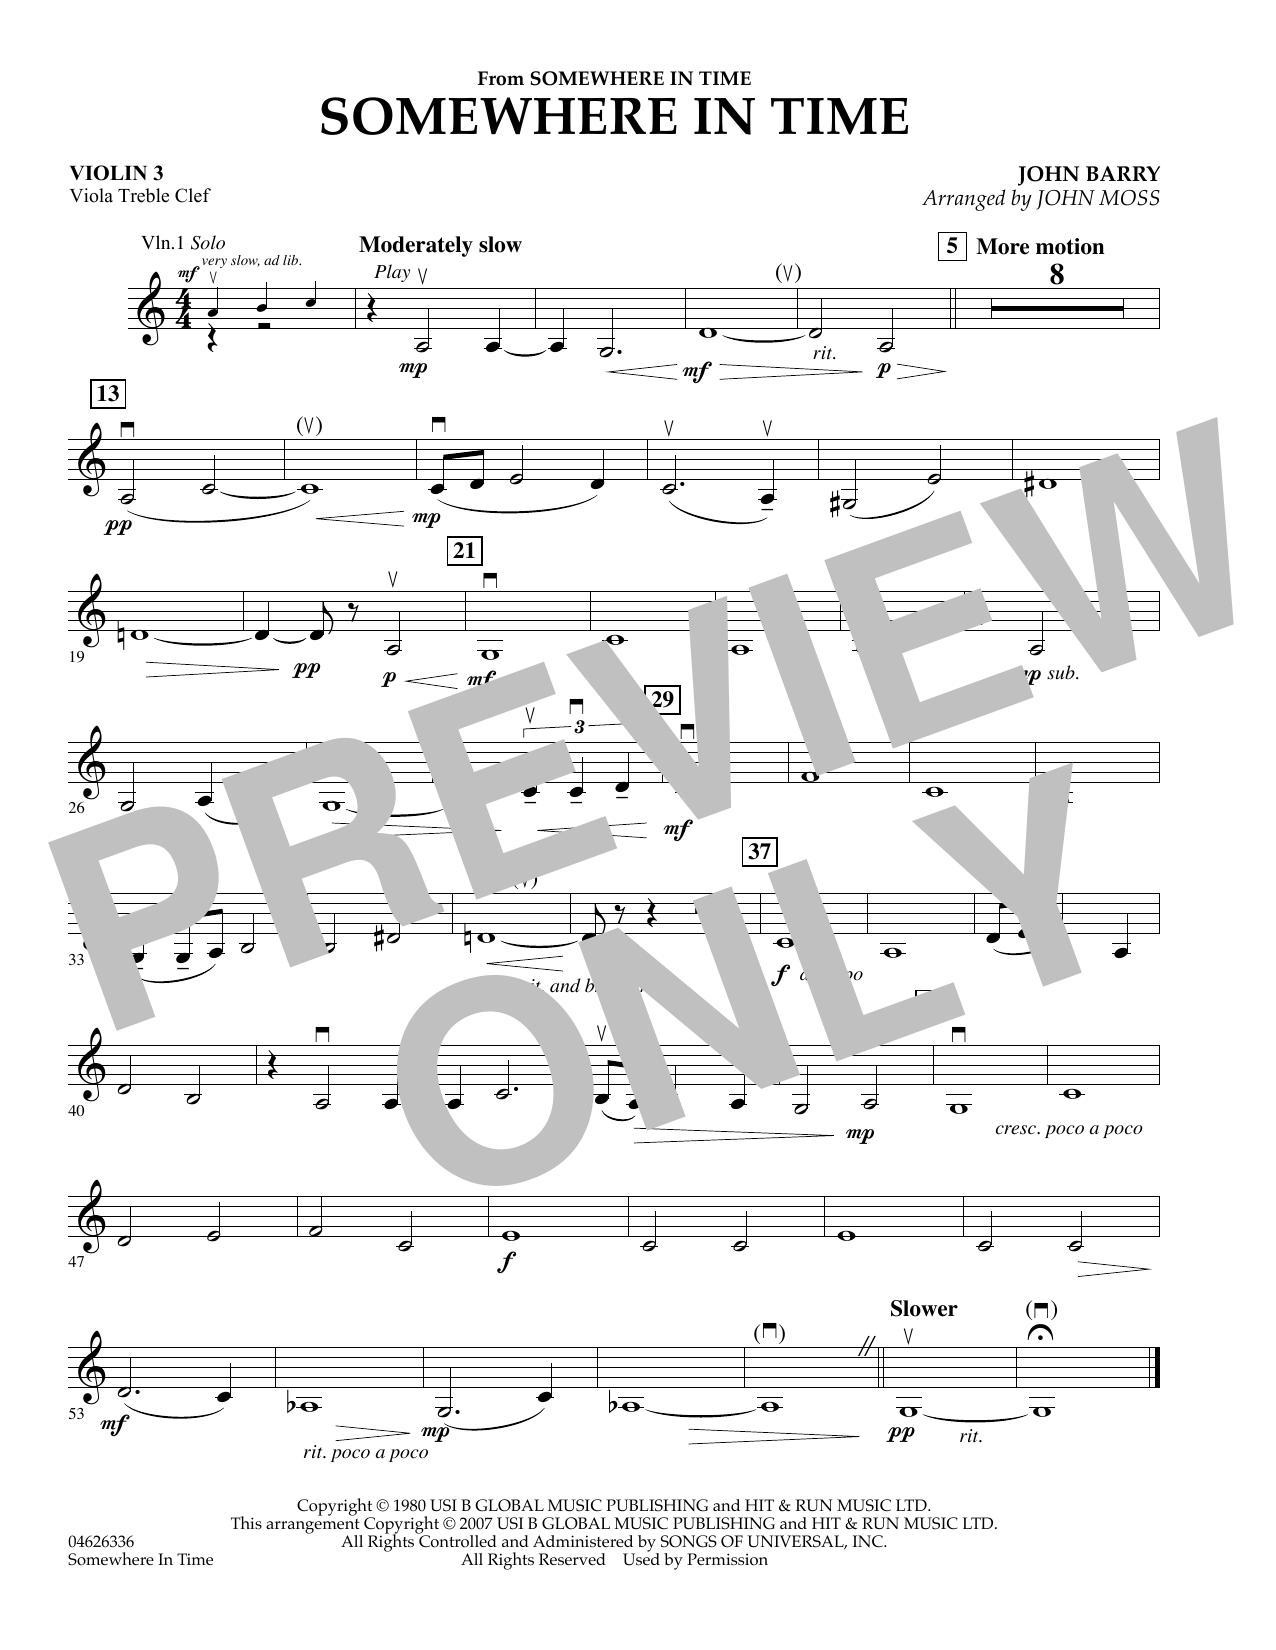 Somewhere in Time - Violin 3 (Viola T.C.) sheet music